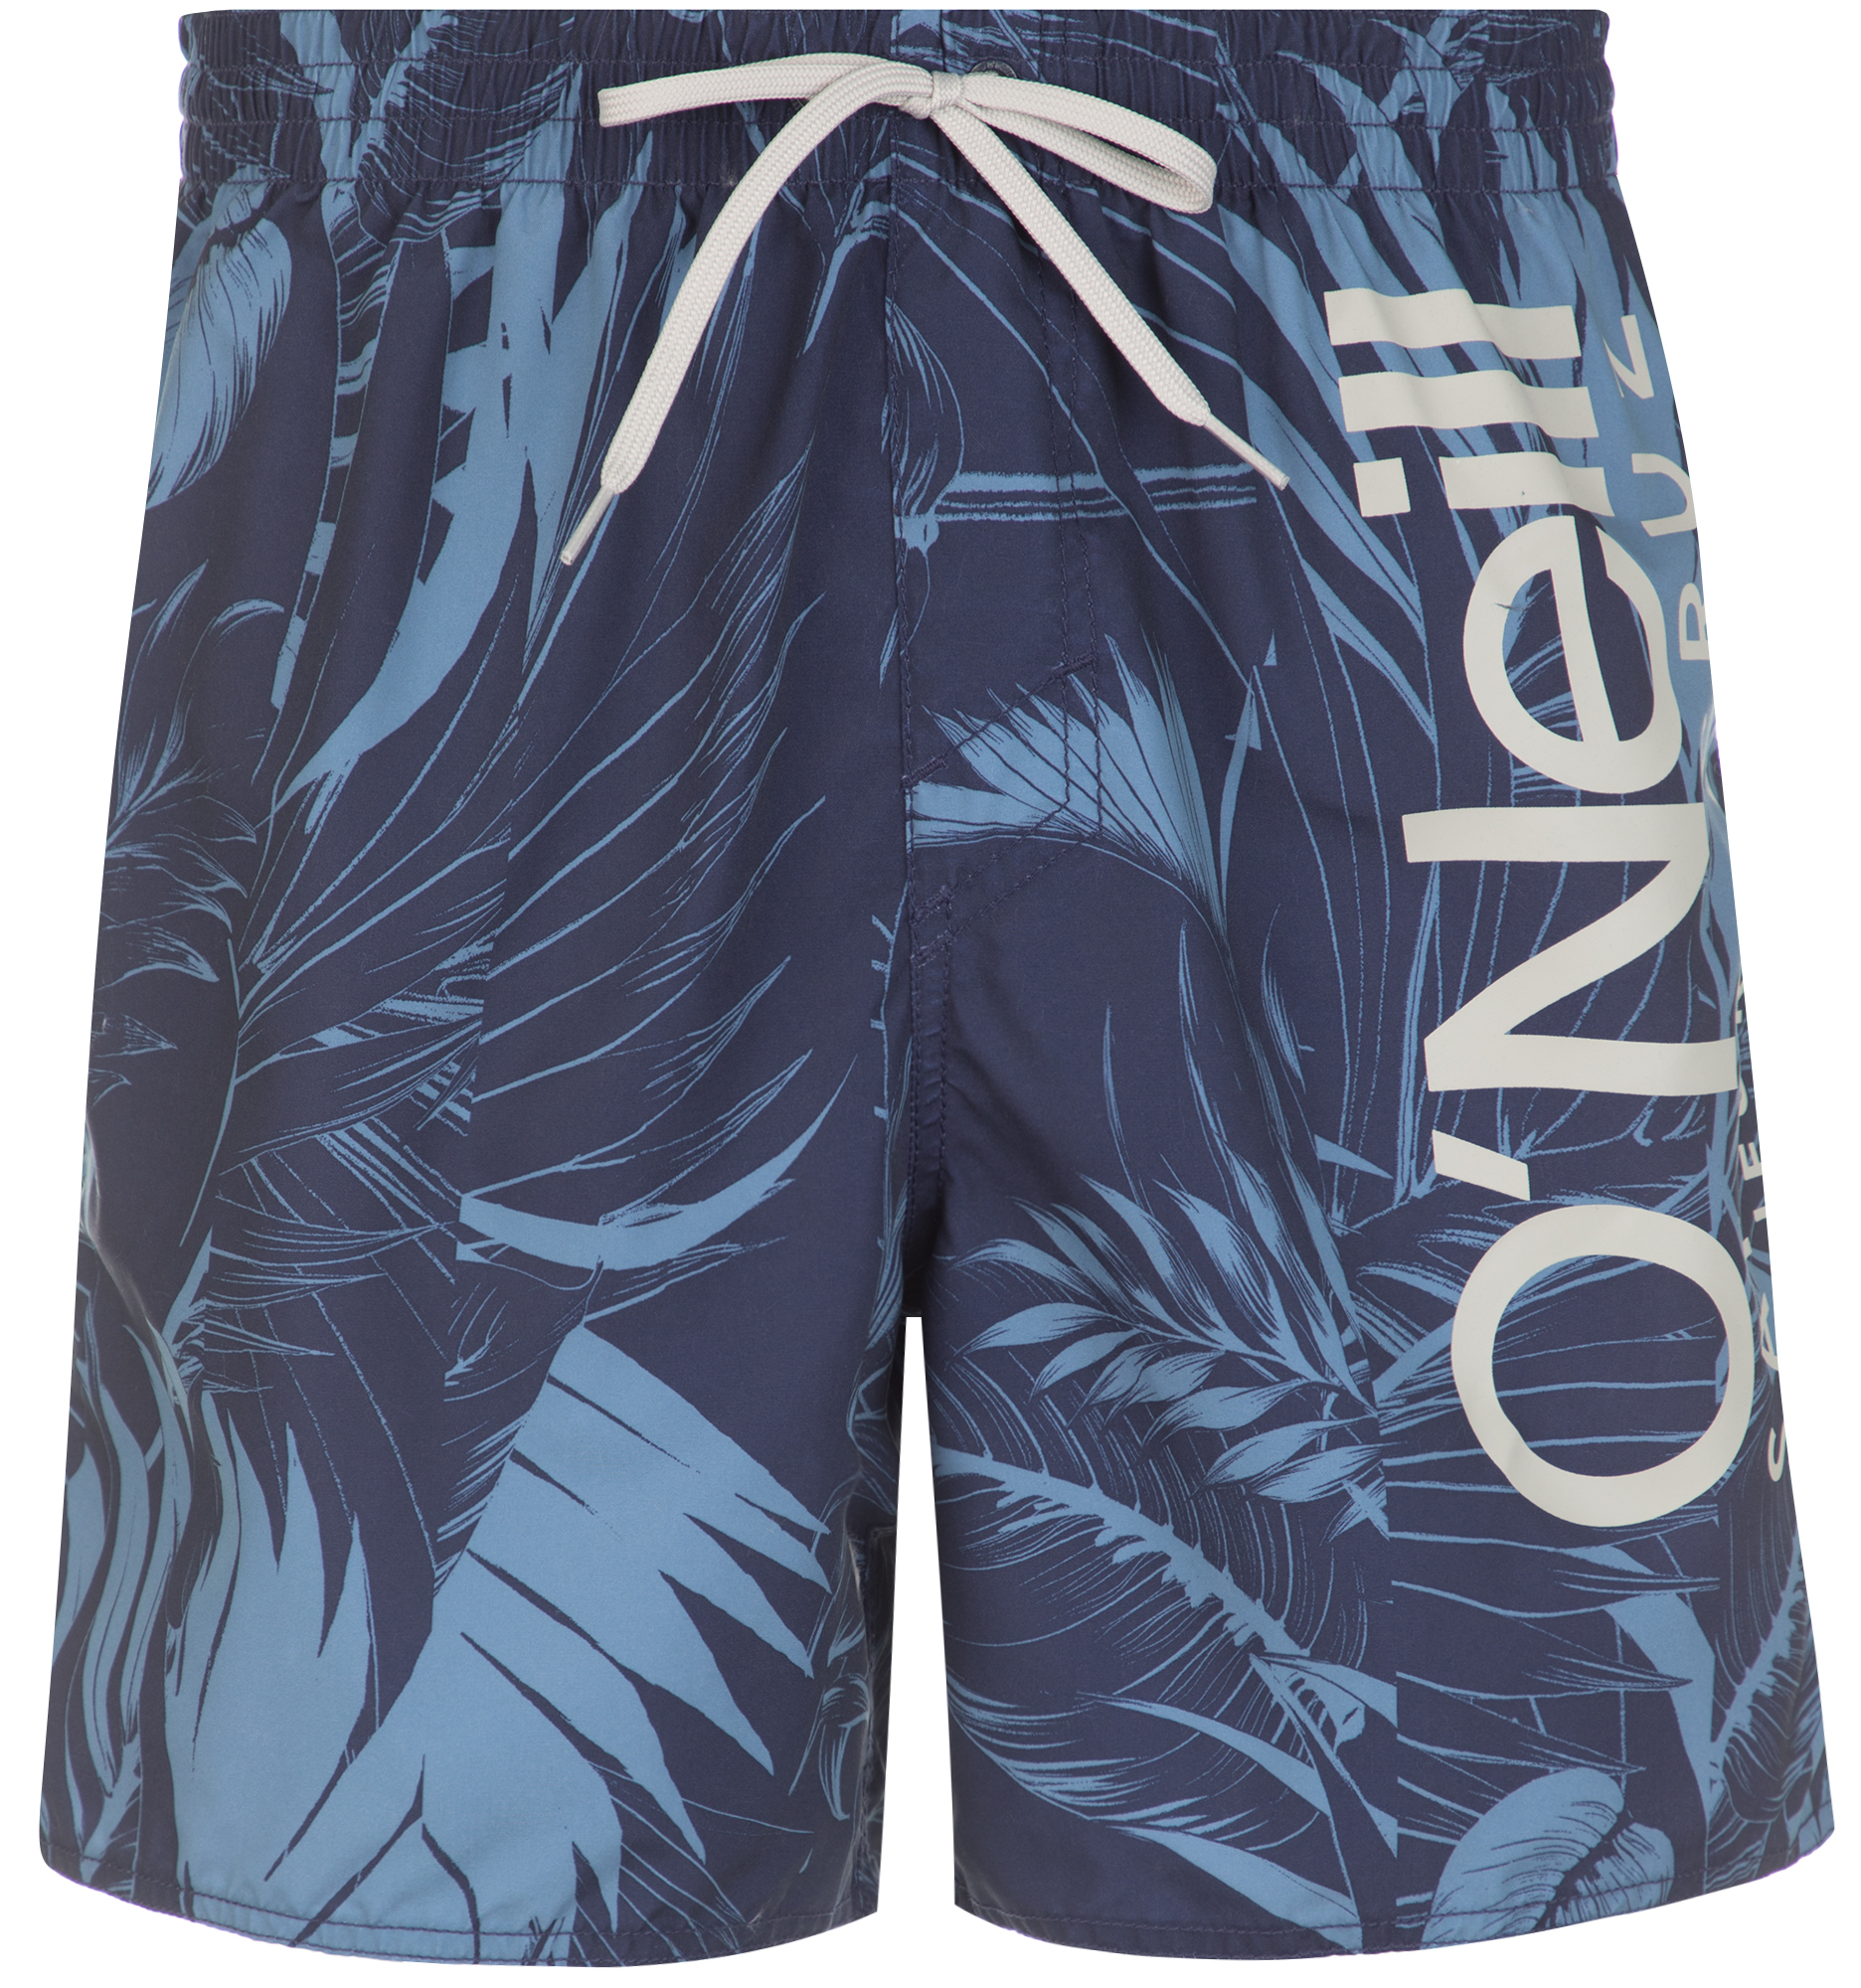 O'Neill Шорты пляжные мужские O'Neill Cali, размер 54-56 шорты пляжные